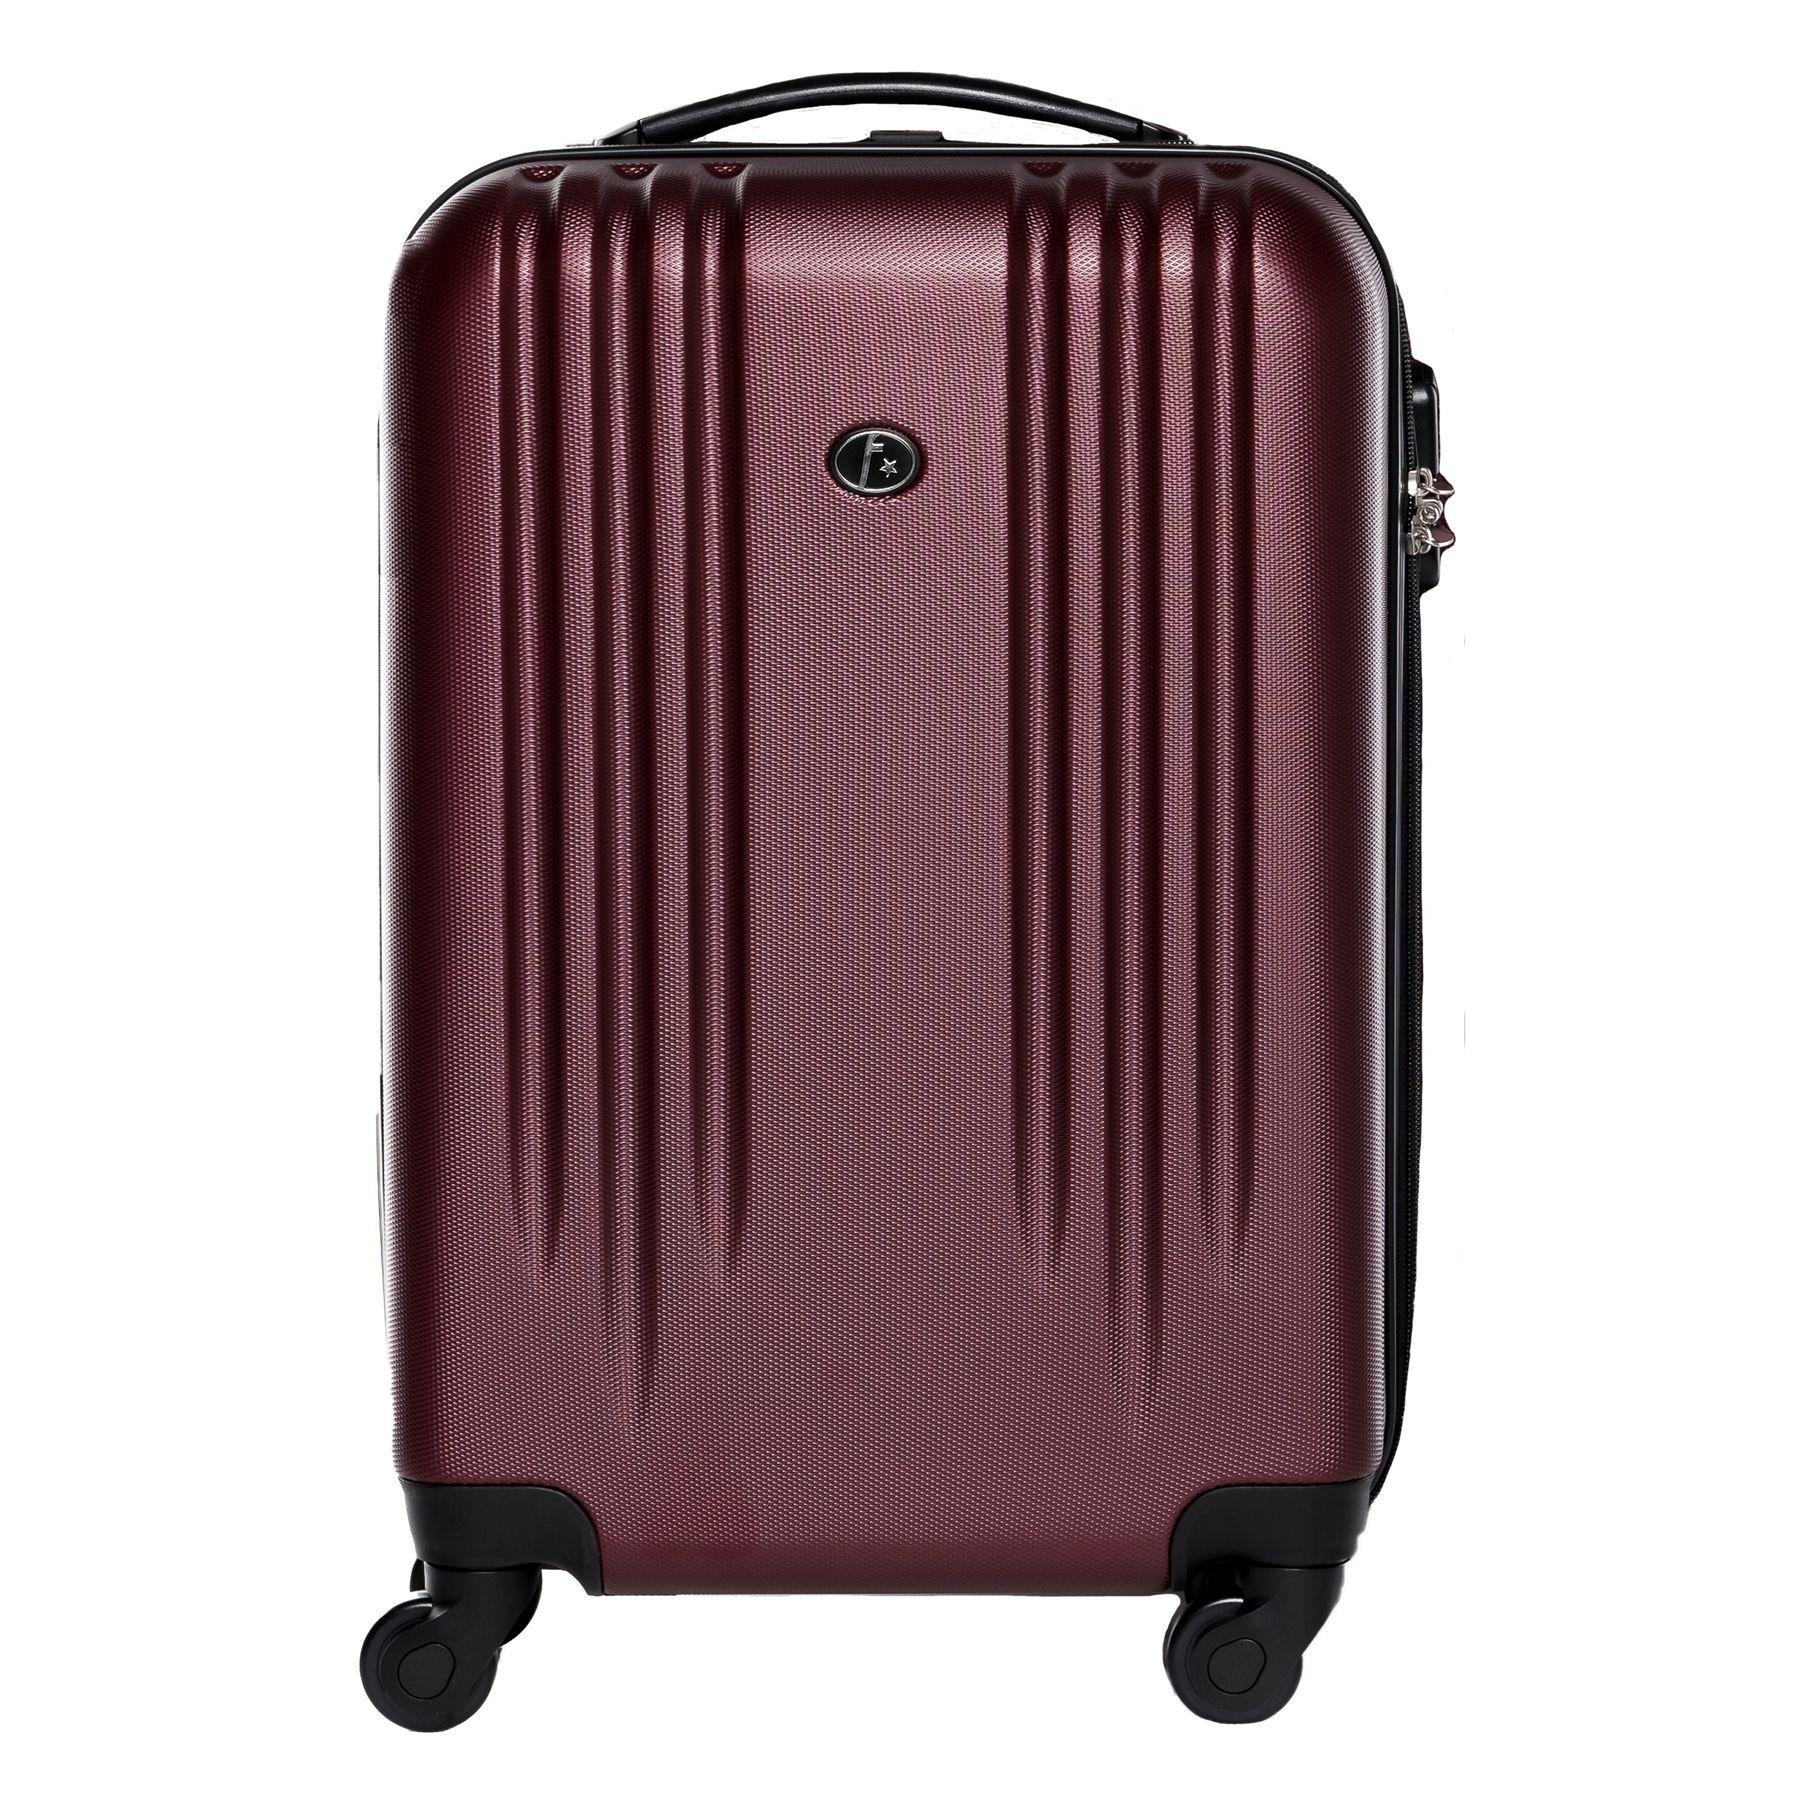 handgep ck hartschalen koffer trolley kabinen reise bordgep ck 55cm 4 rollen rot ebay. Black Bedroom Furniture Sets. Home Design Ideas